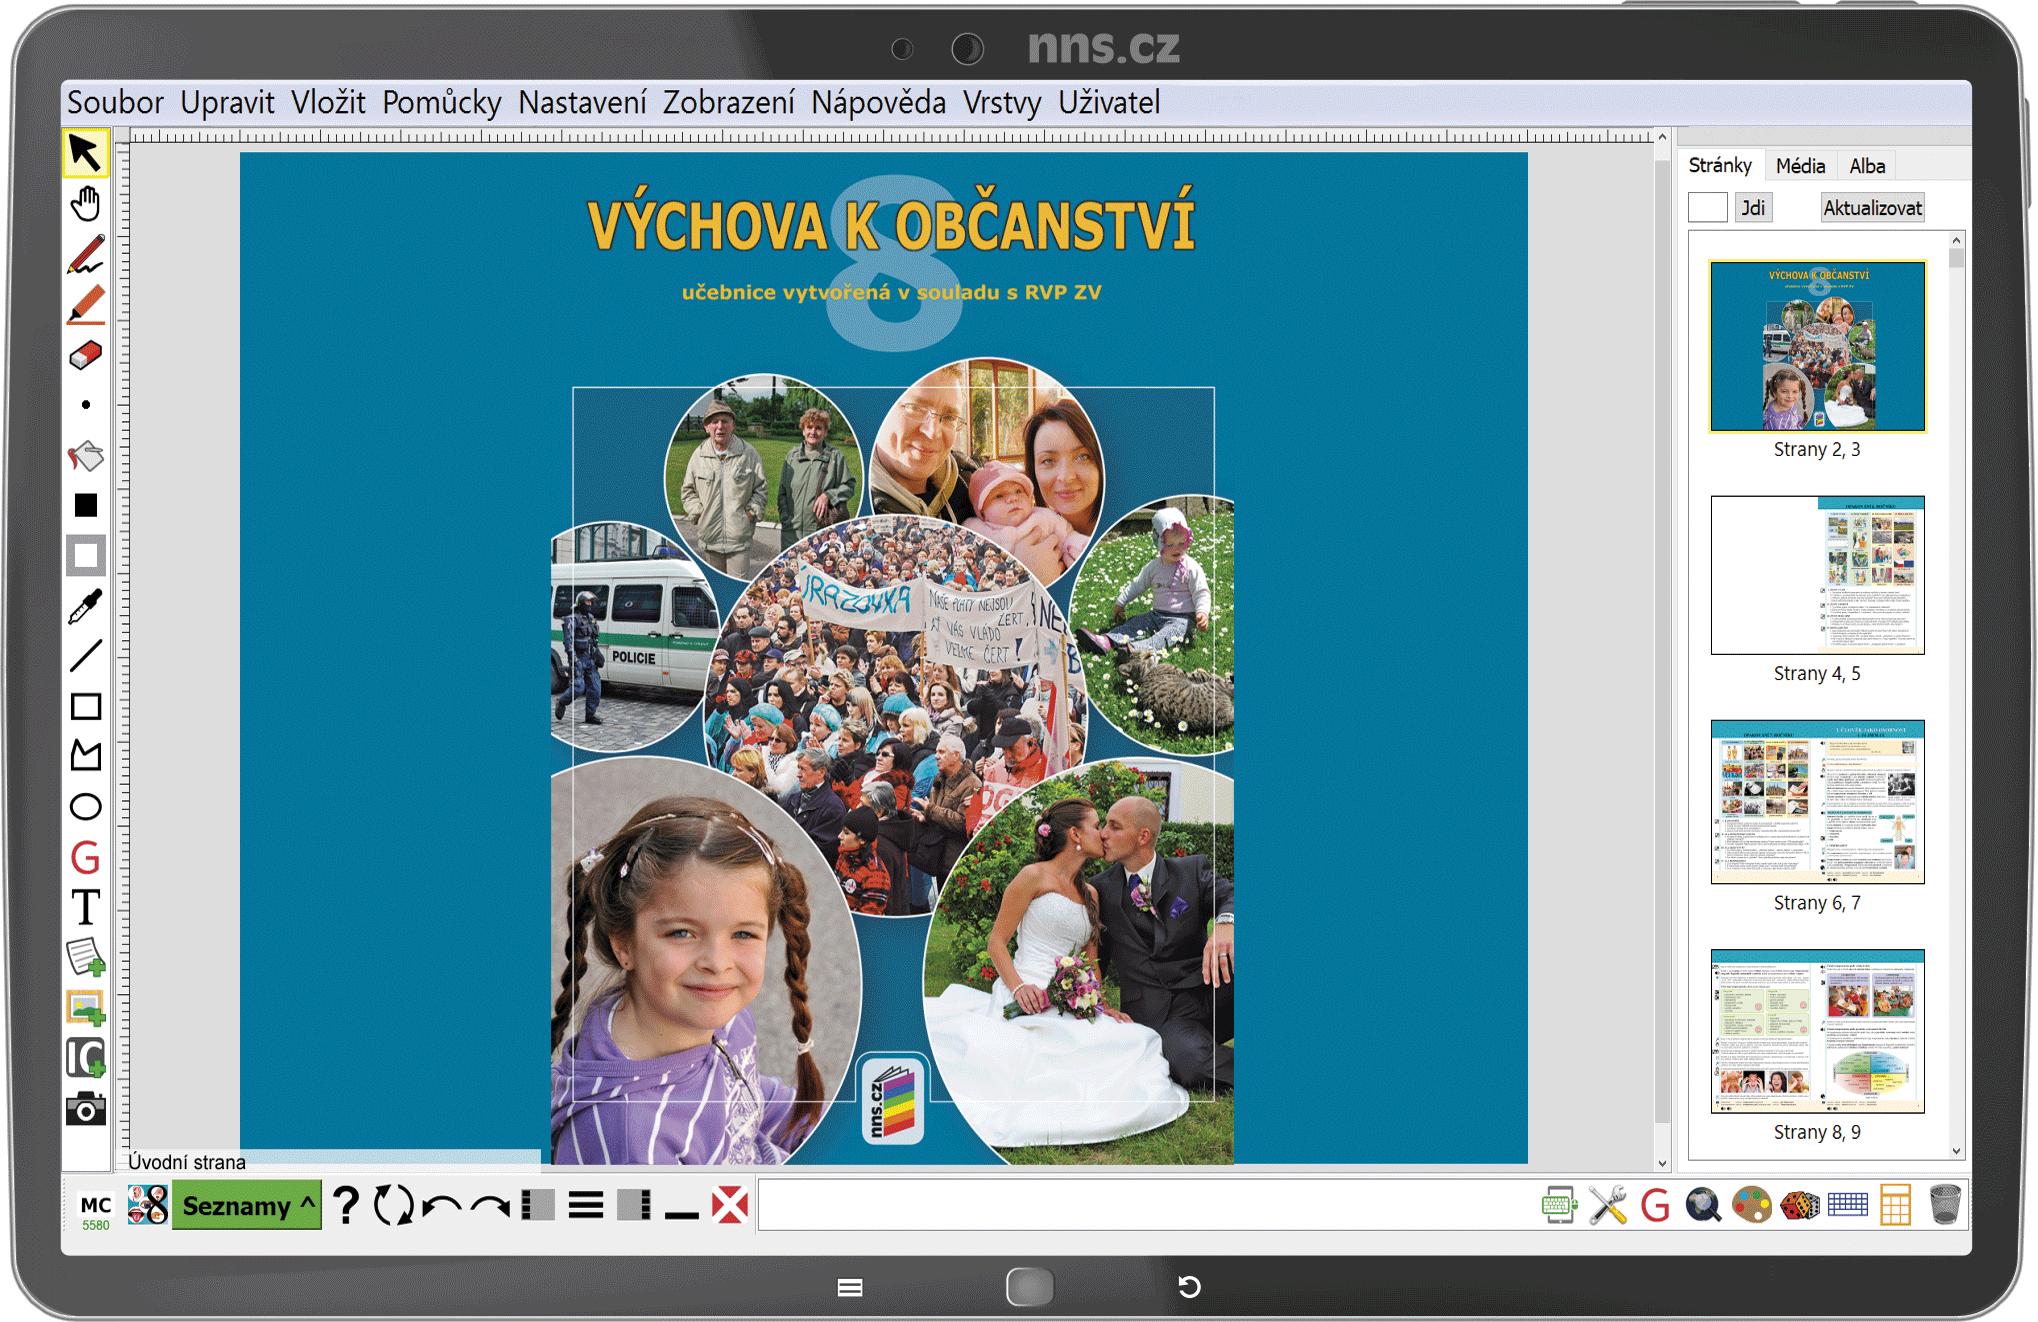 MIUč+ Výchova k občanství 8 - žák. licence na 1 šk. rok